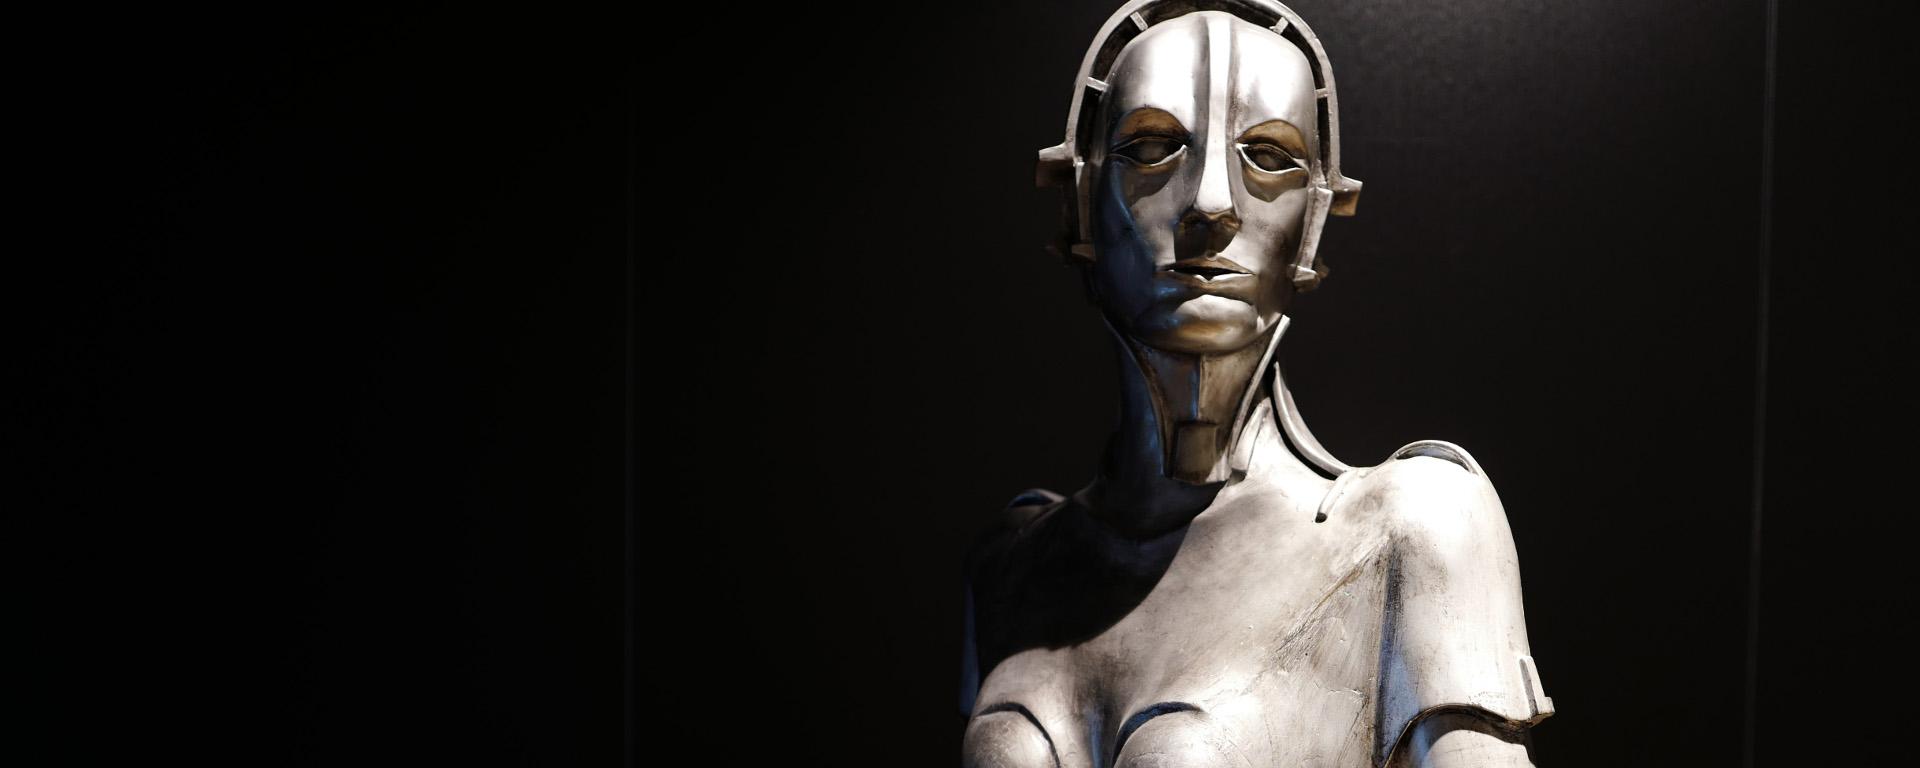 Robotik . Mechatronik . Bionik . Automation